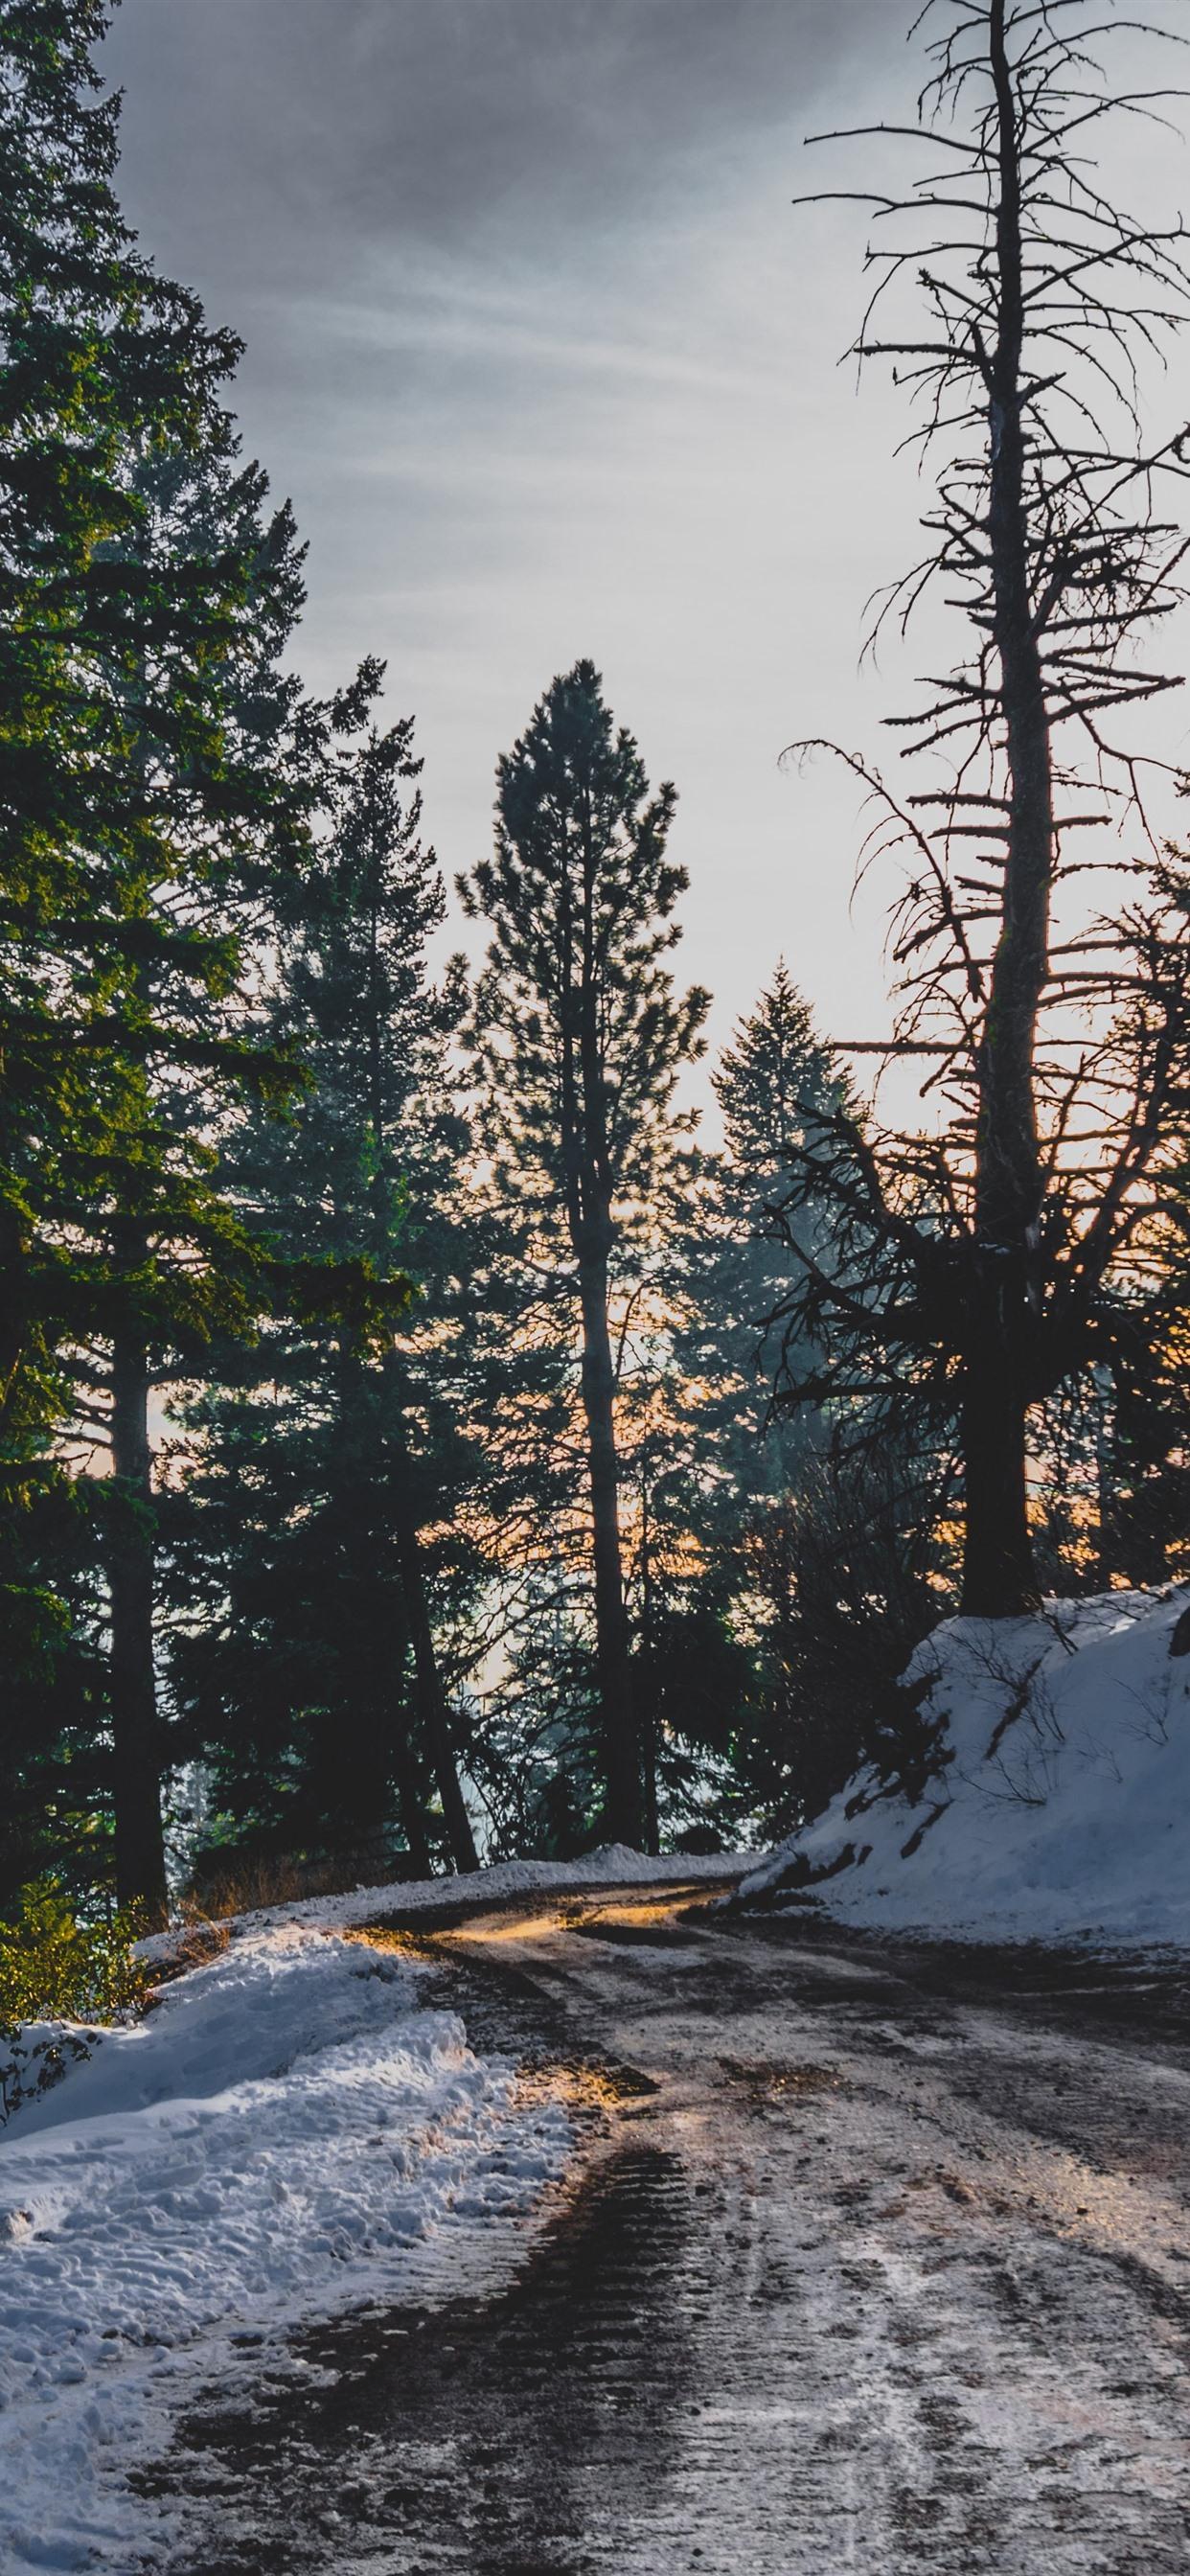 Trees Snow Winter Path Sun Rays 1242x2688 Iphone Xs Max